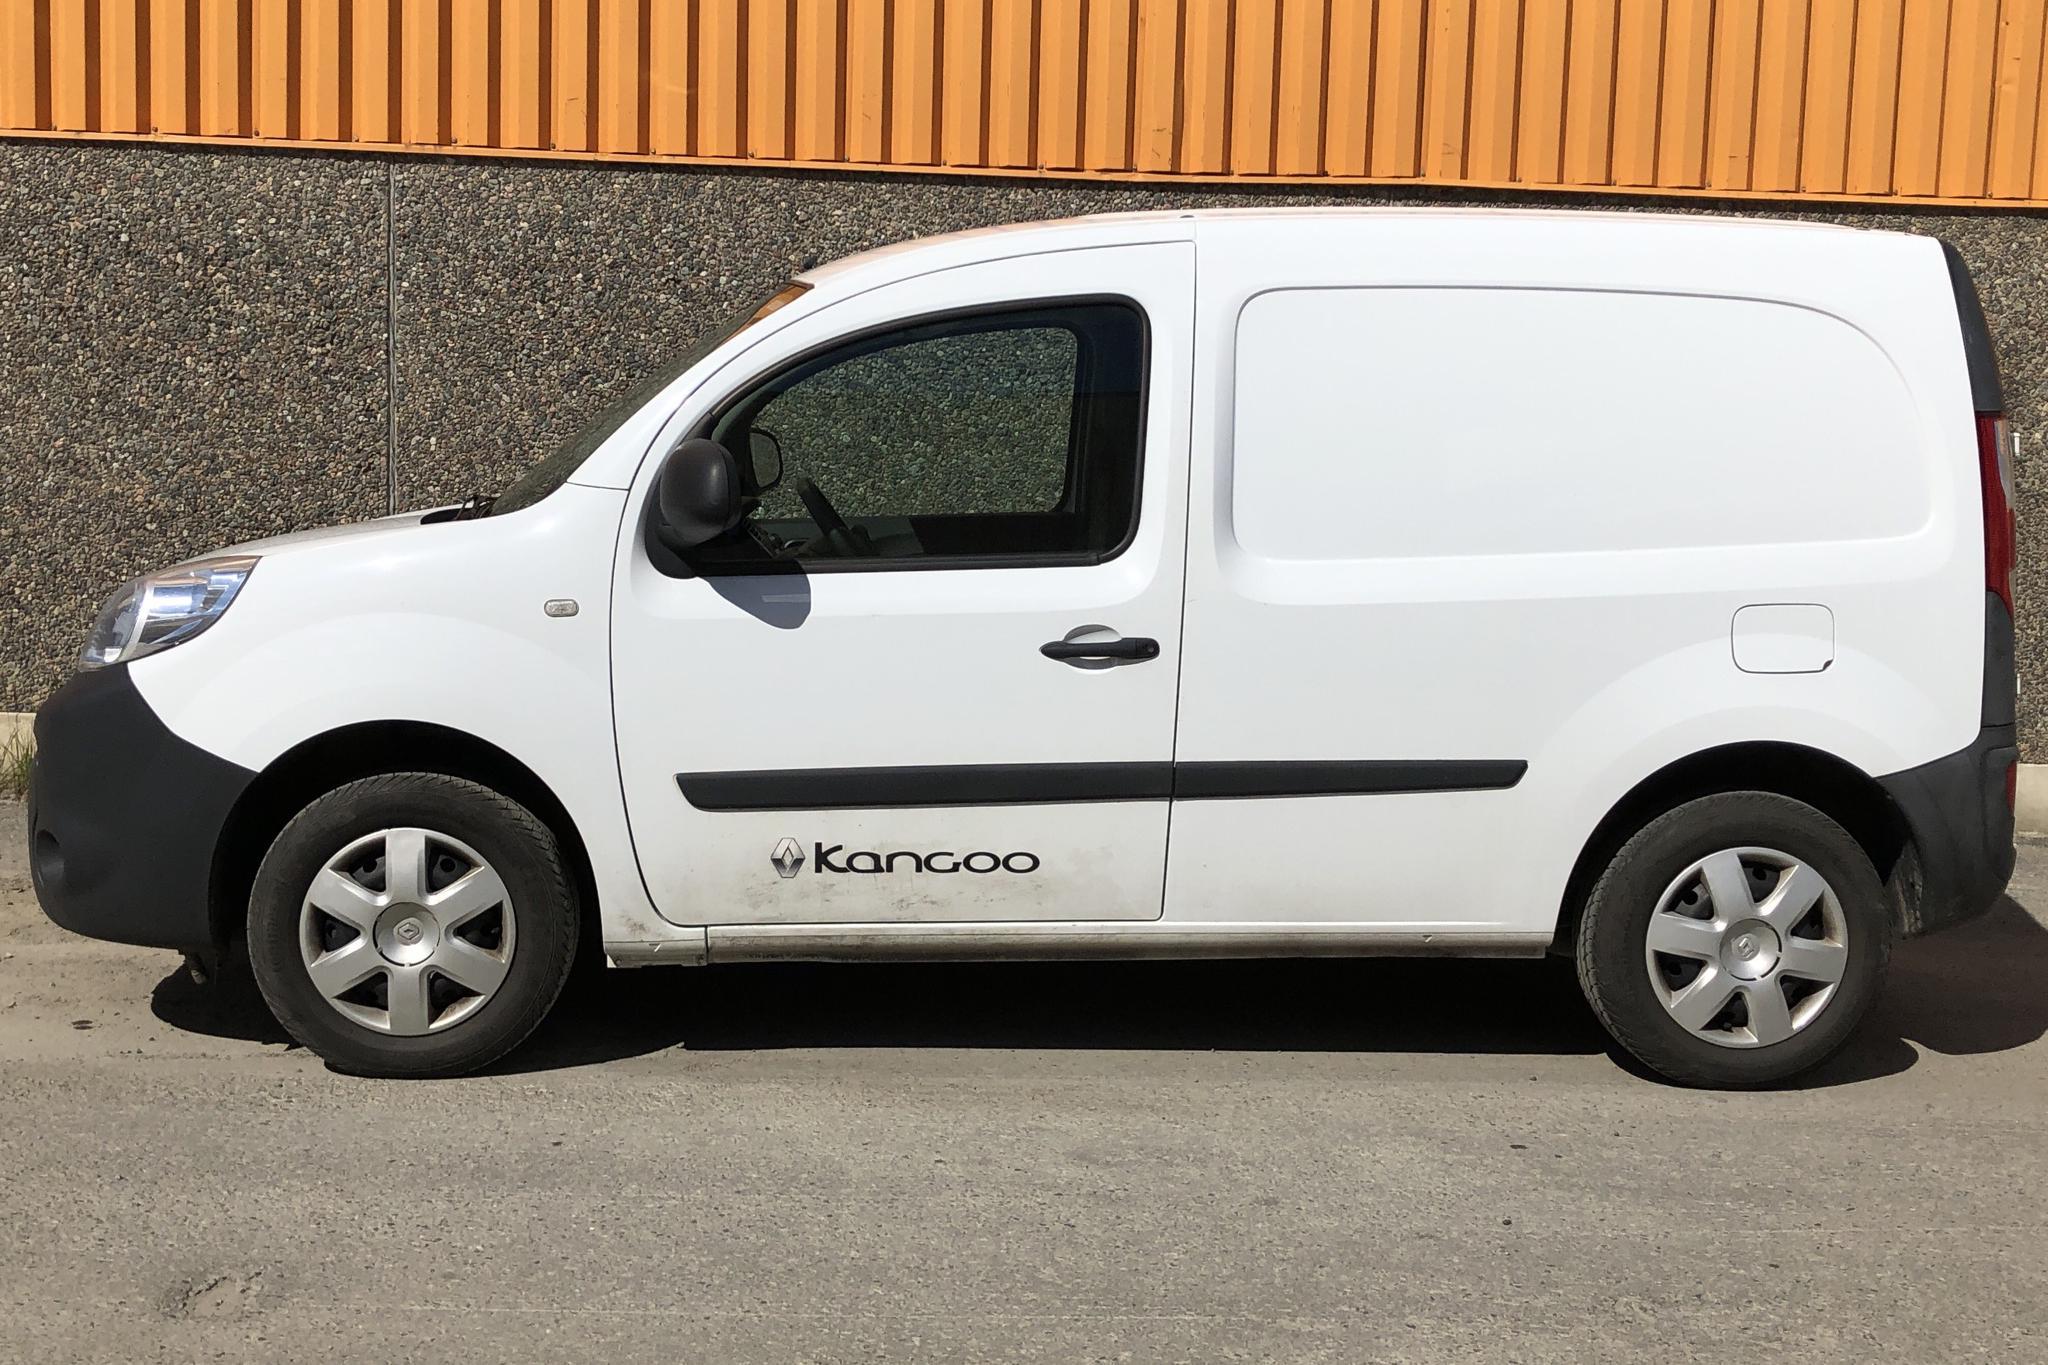 Renault Kangoo 1.5 dCi Skåp (75hk) - 3 941 mil - Manuell - vit - 2016